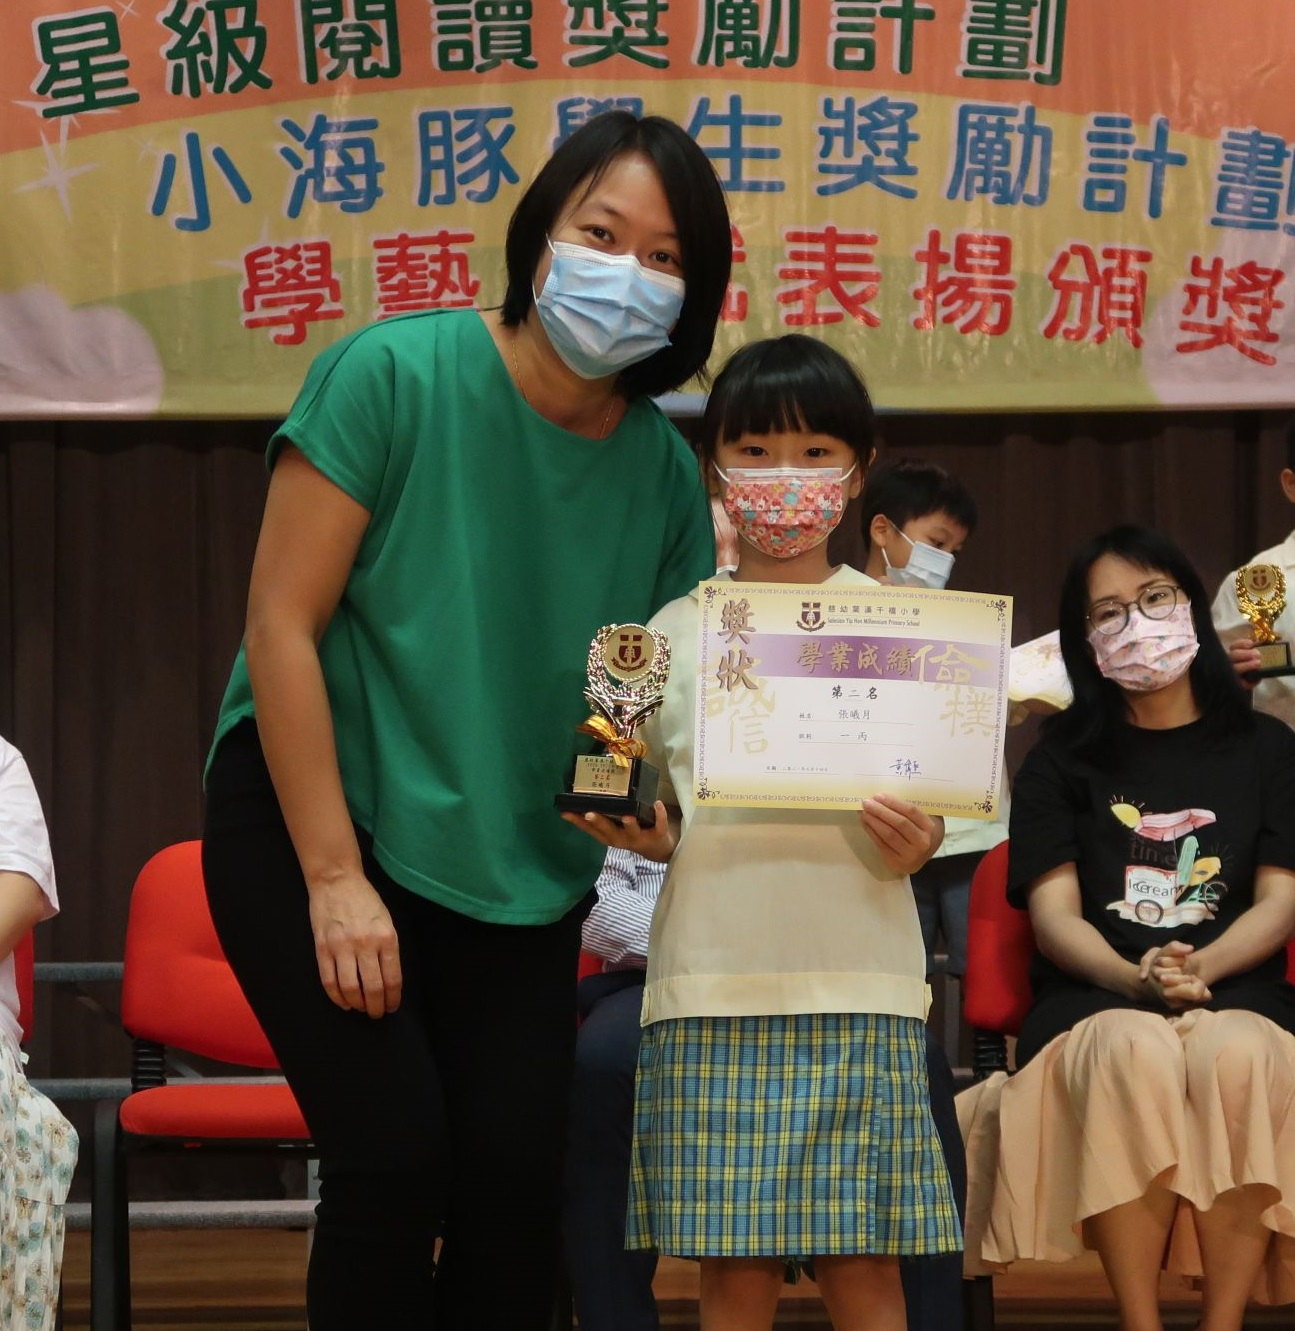 https://syh.edu.hk/sites/default/files/img_5378.jpg